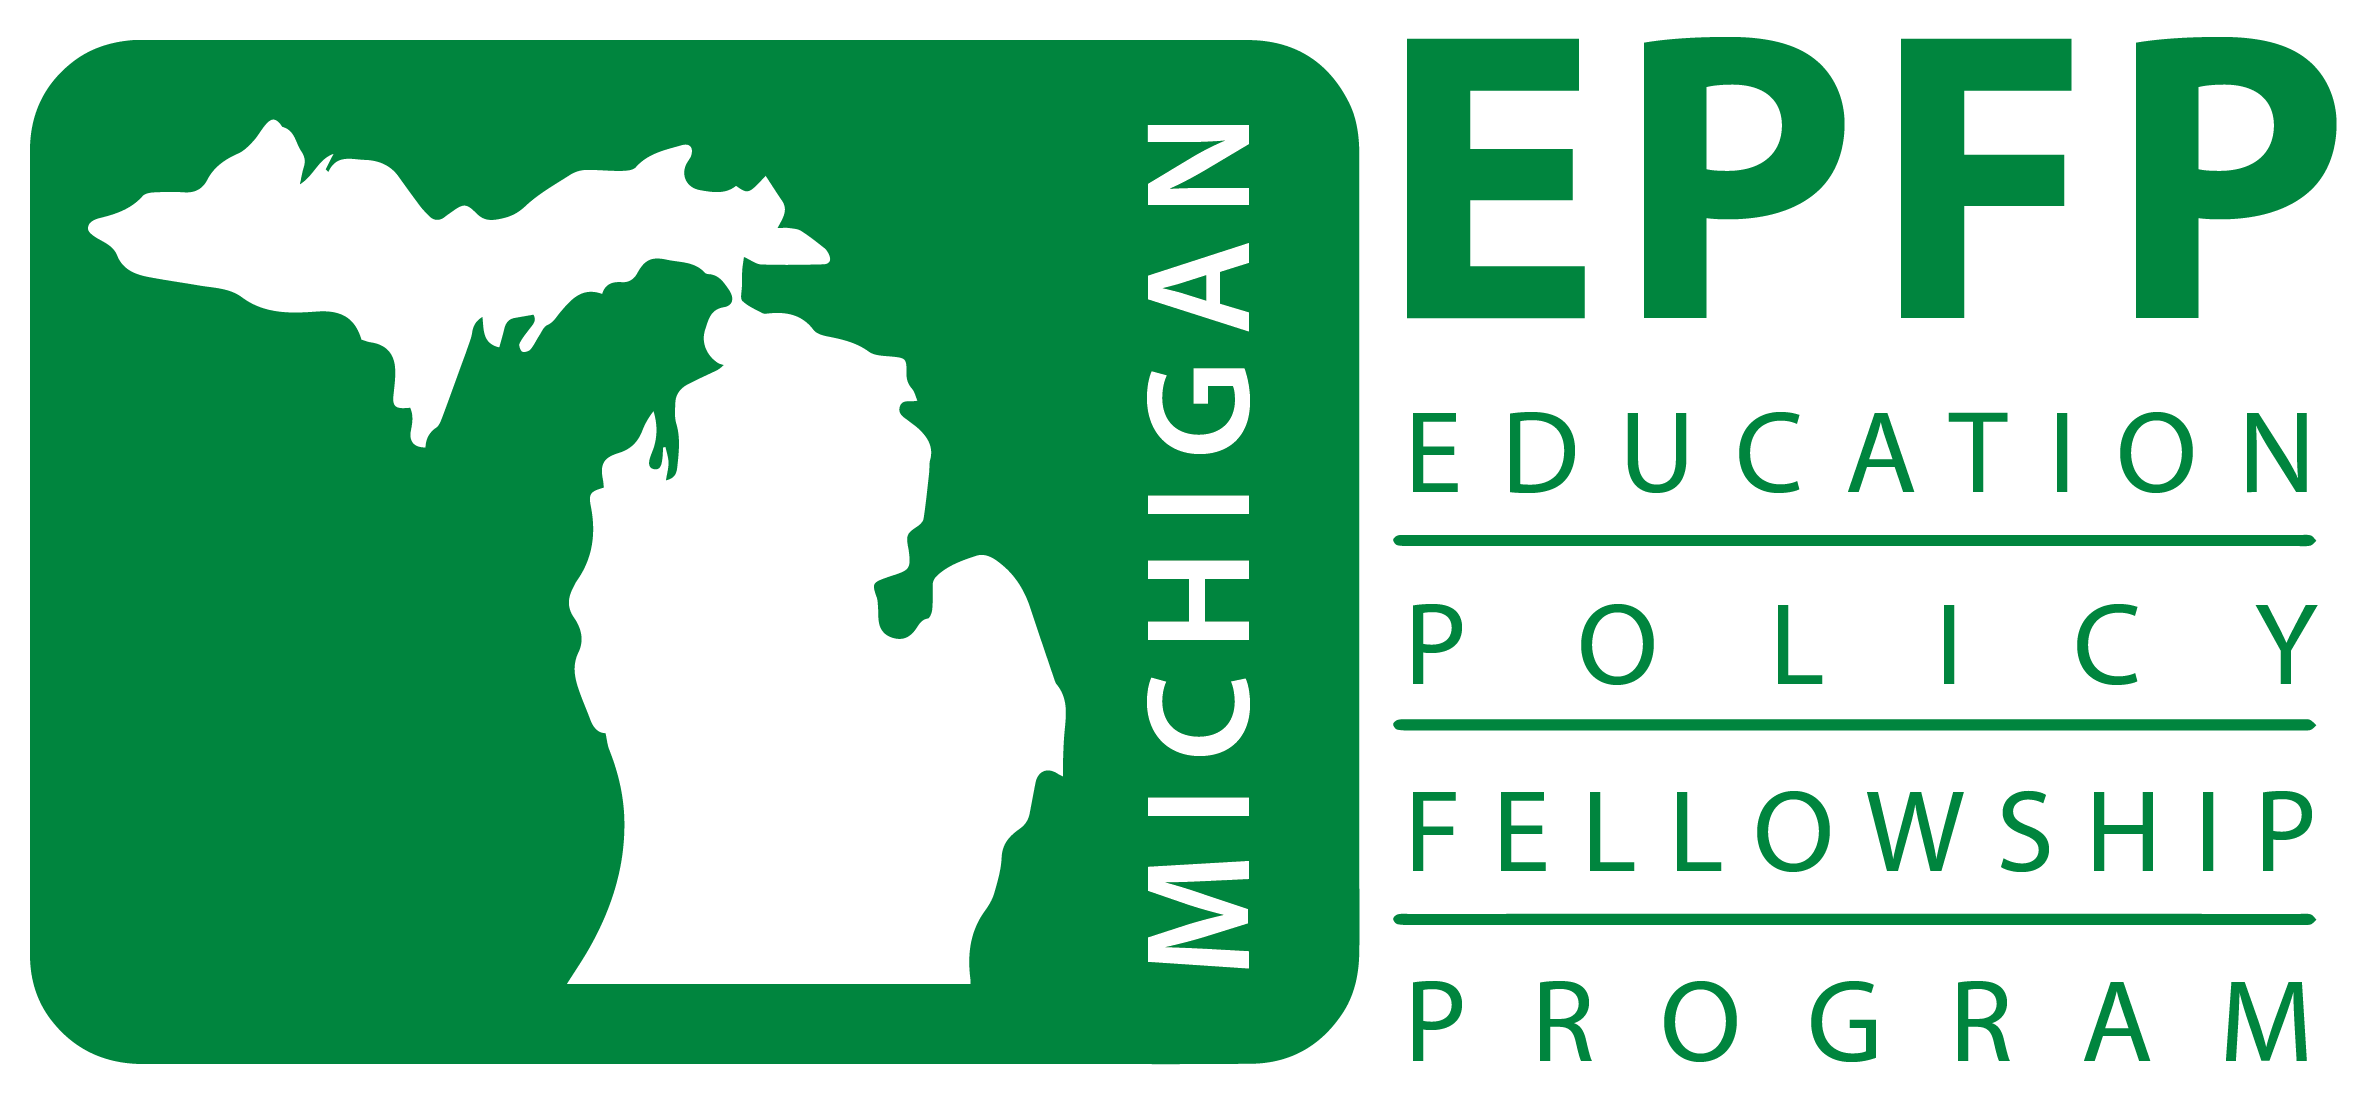 Educational Policy Fellowship Program logo